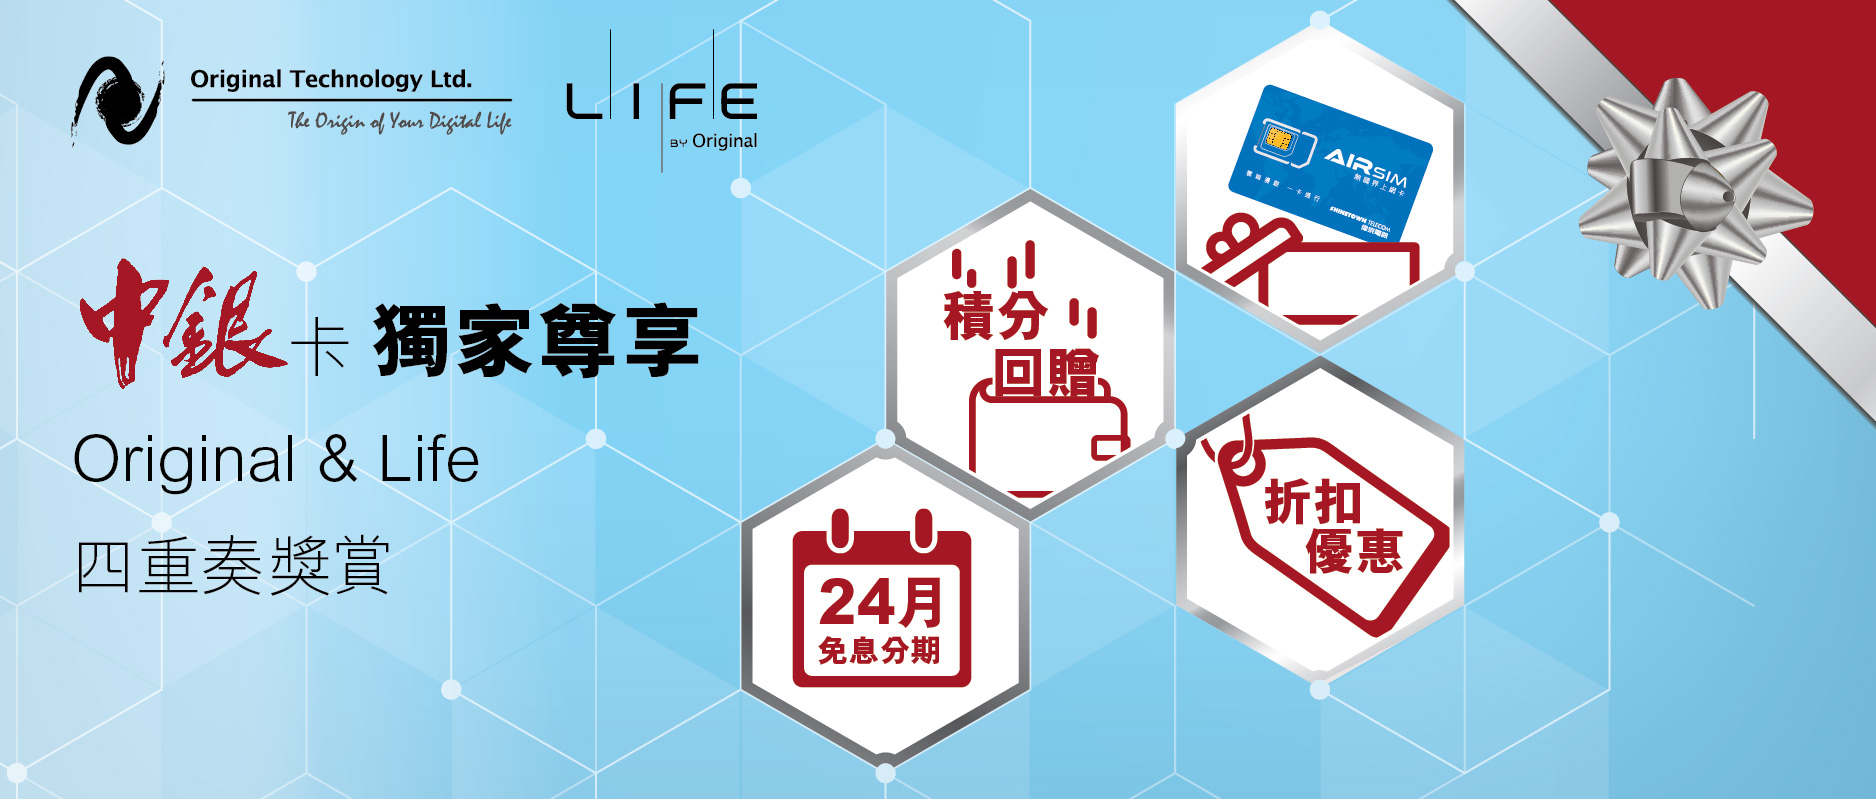 中銀卡優惠|BOC Promo